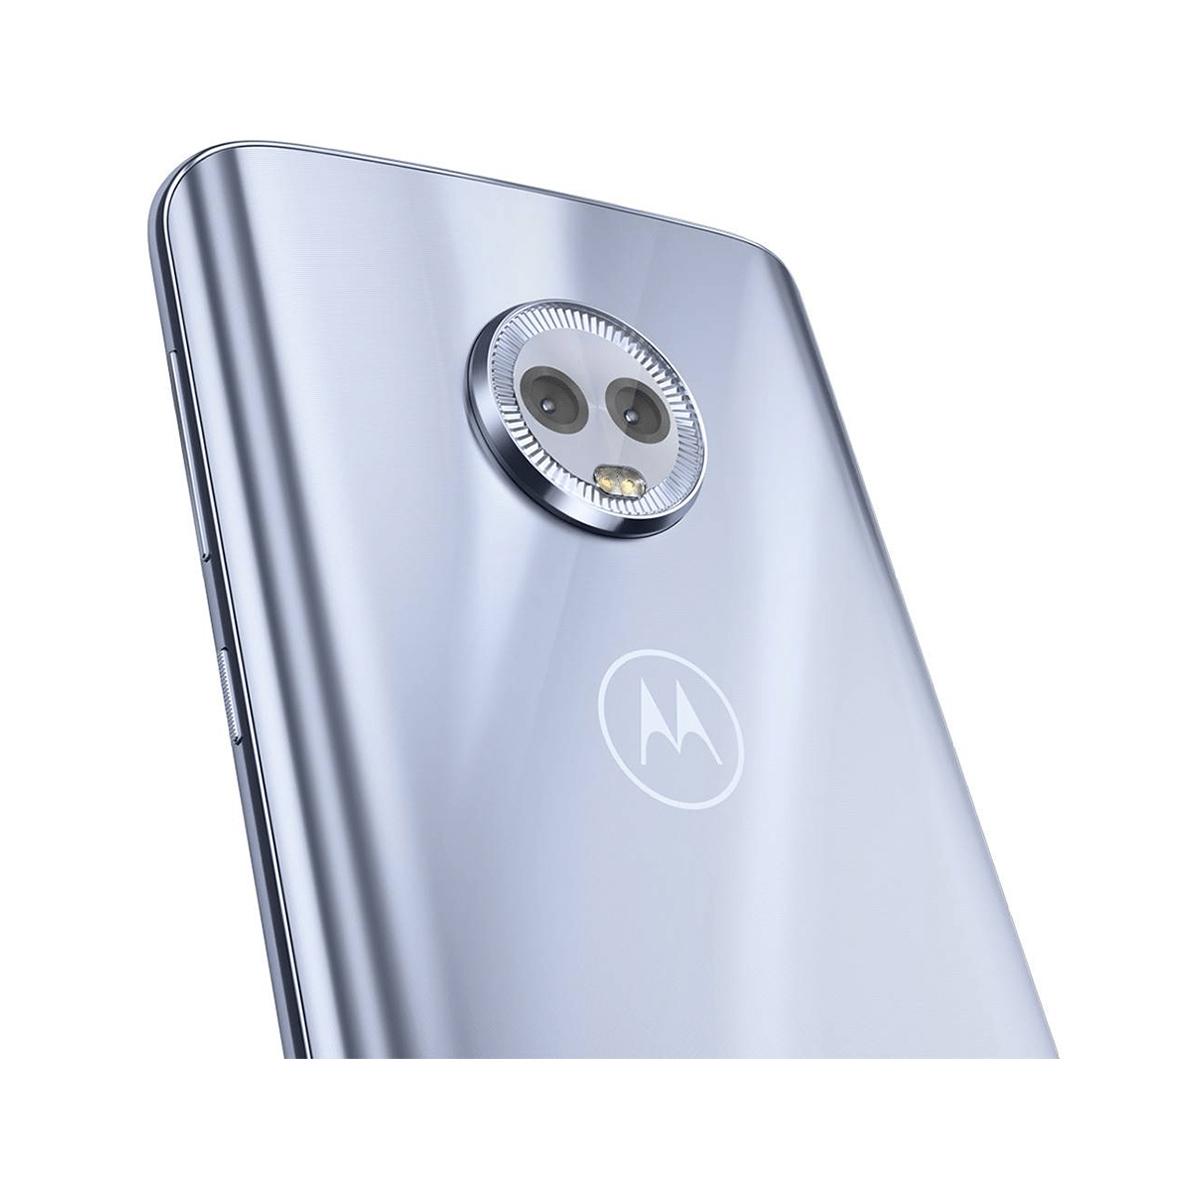 Motorola Moto G6 Plus Tv Xt1926 Dual 64gb - Mostruário